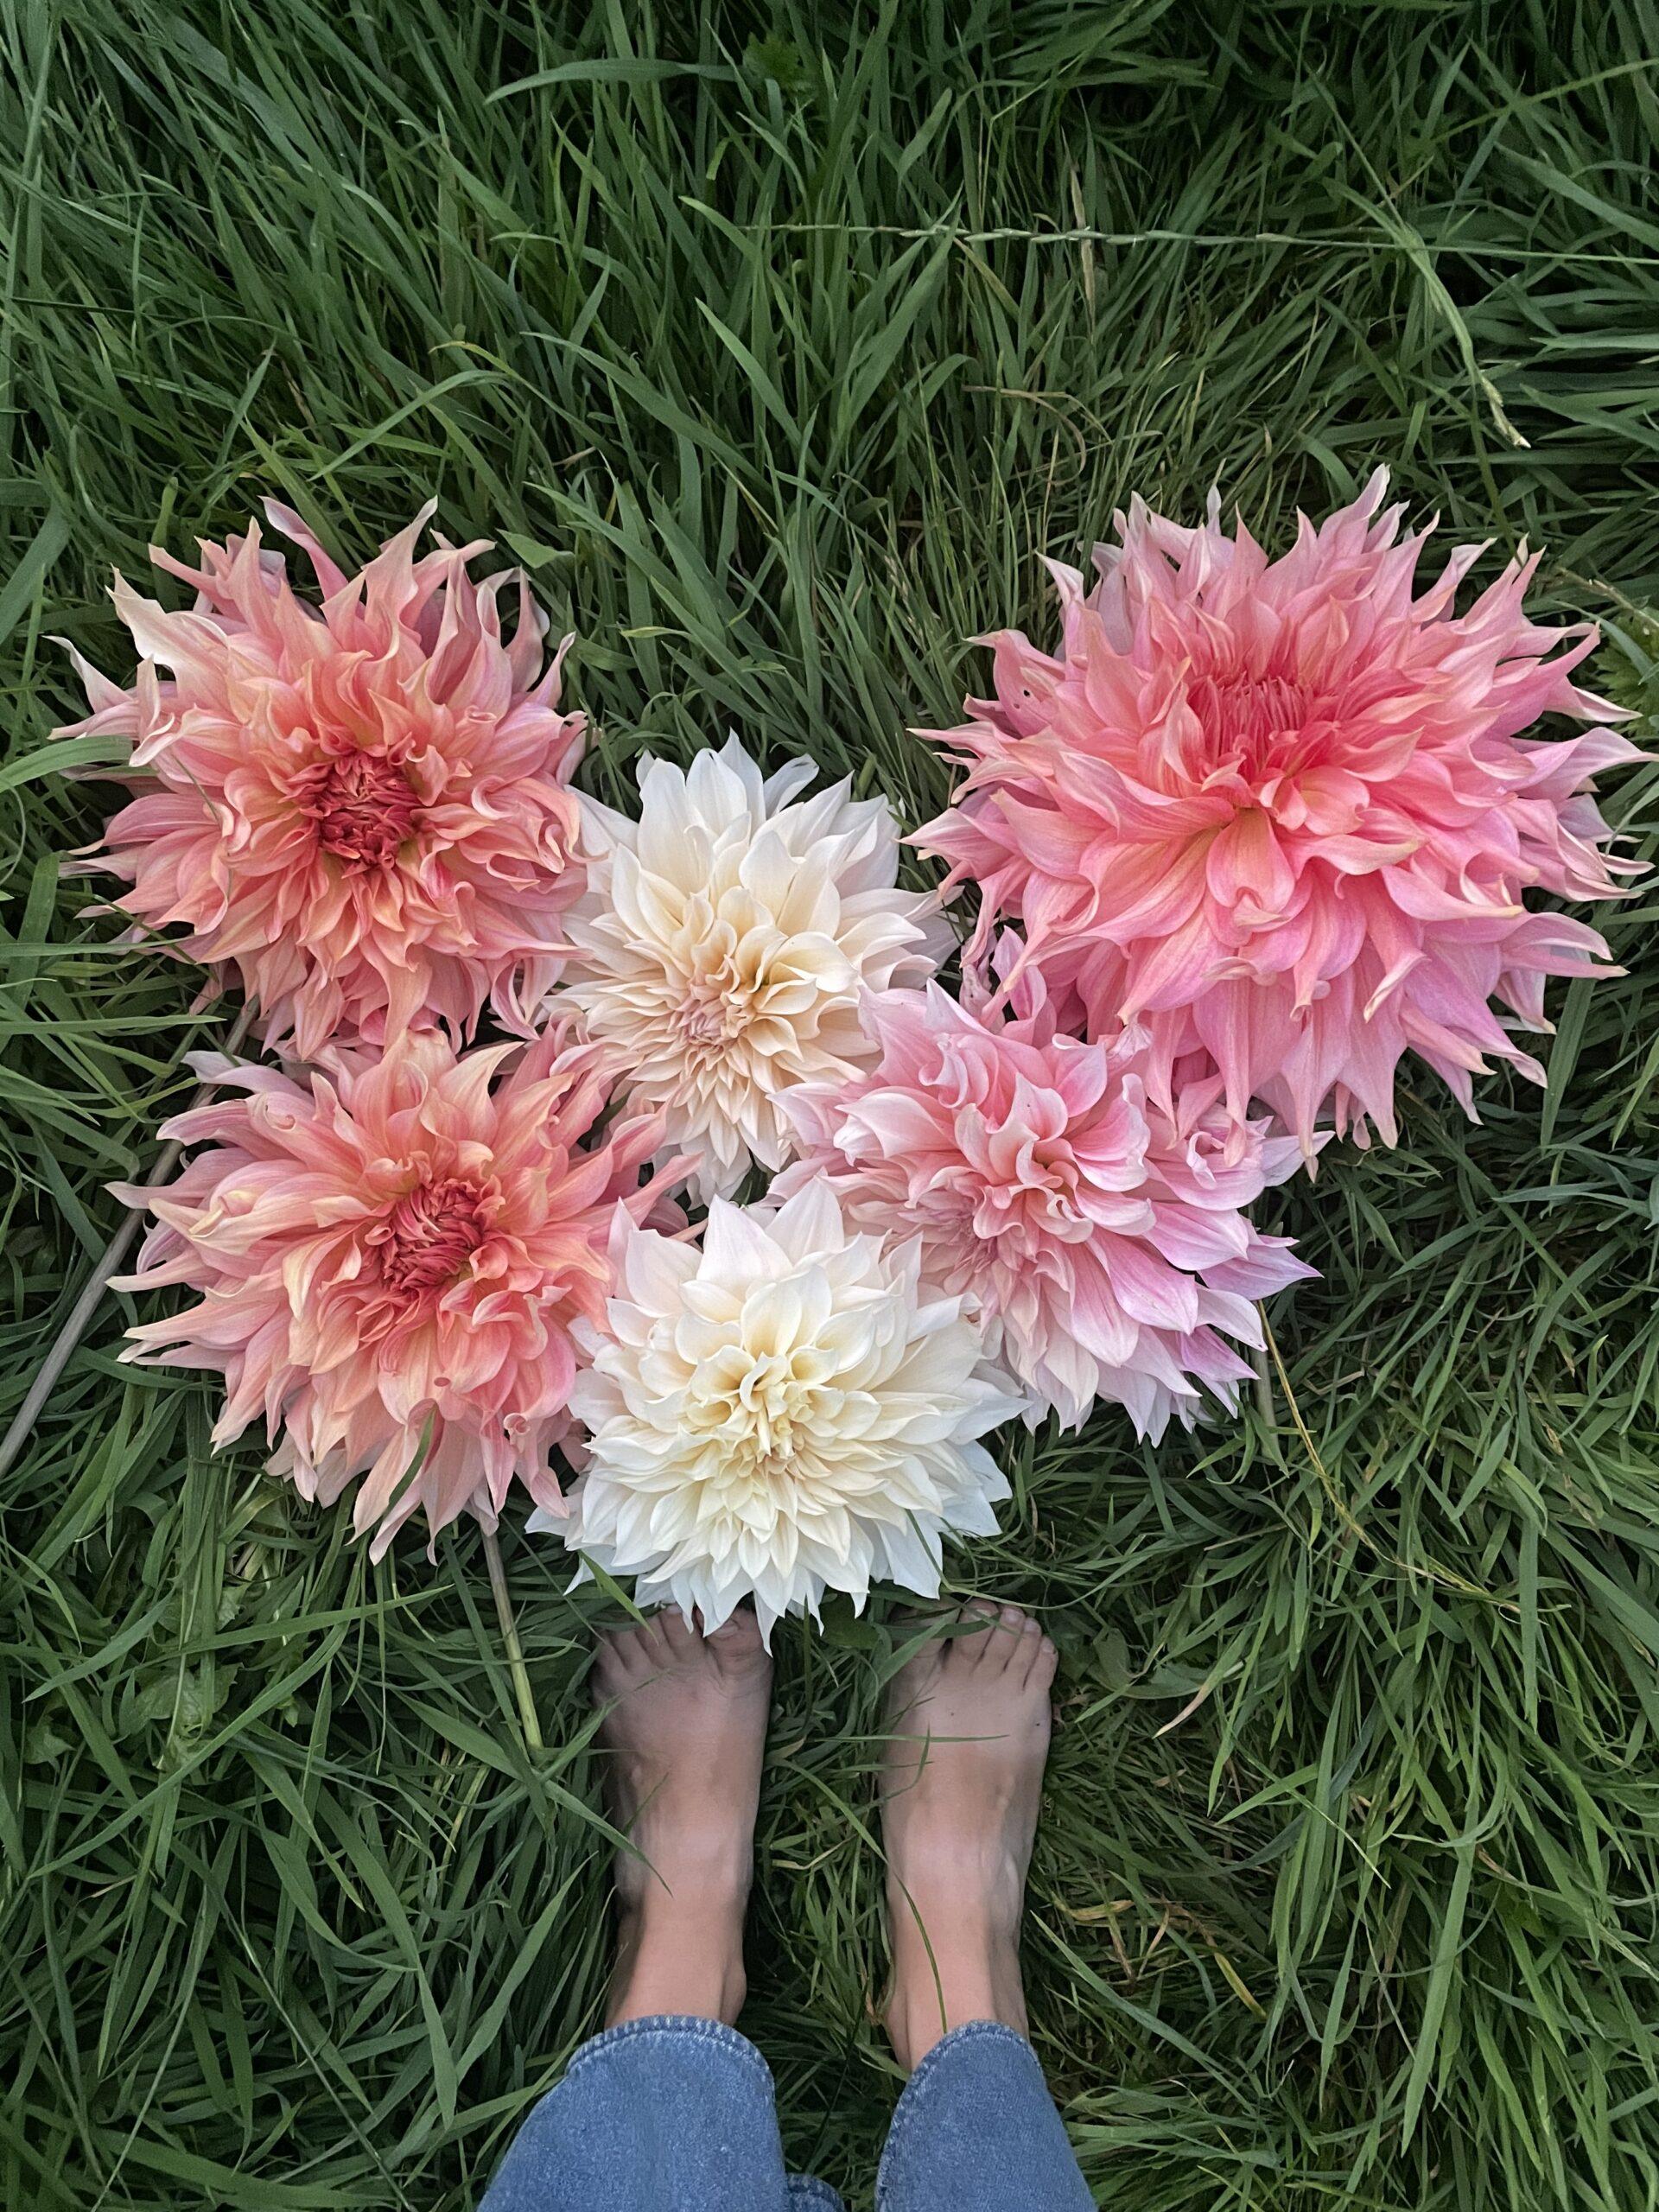 British grown dahlias harvested at Deadhead Flower Farm